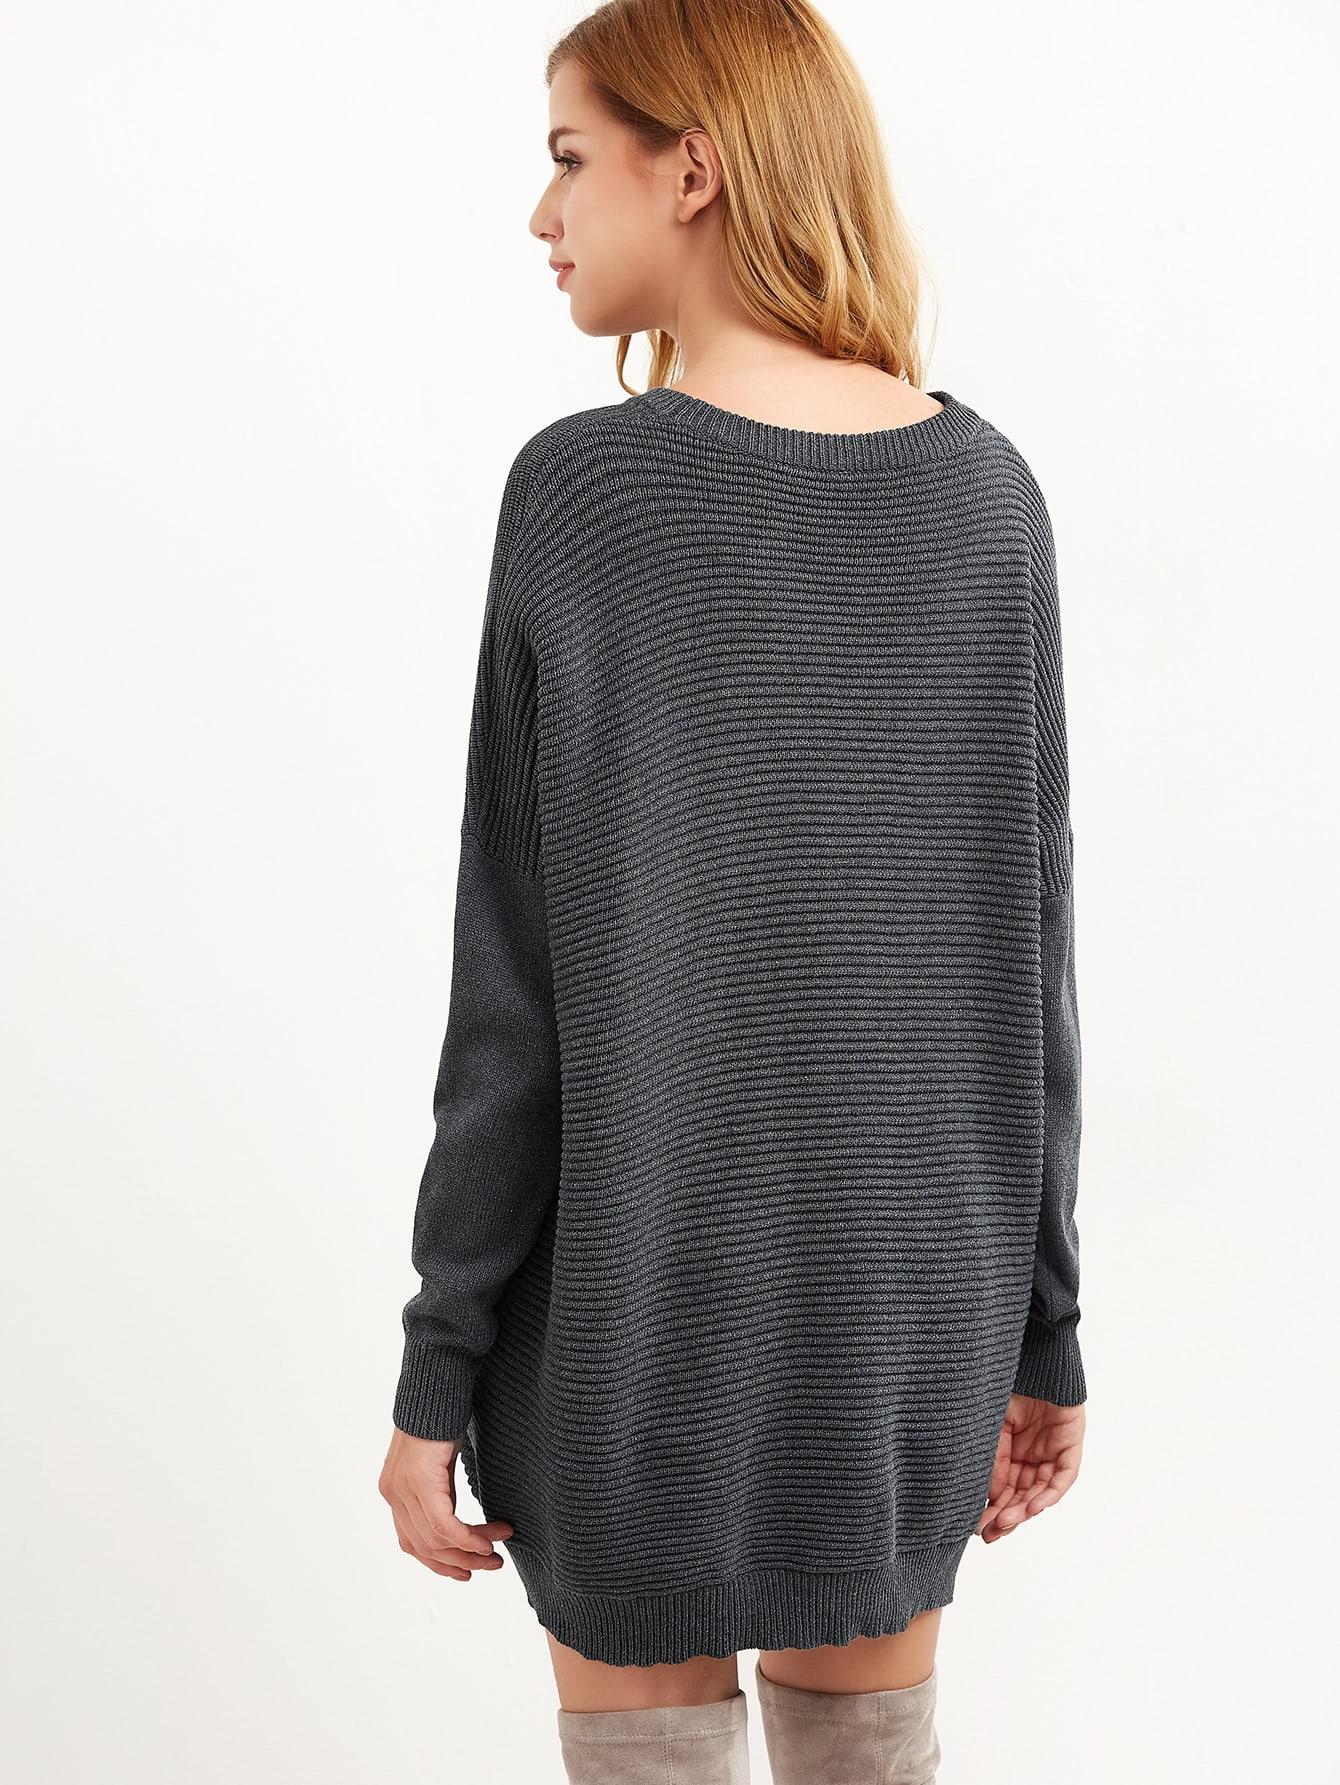 sweater161107461_2